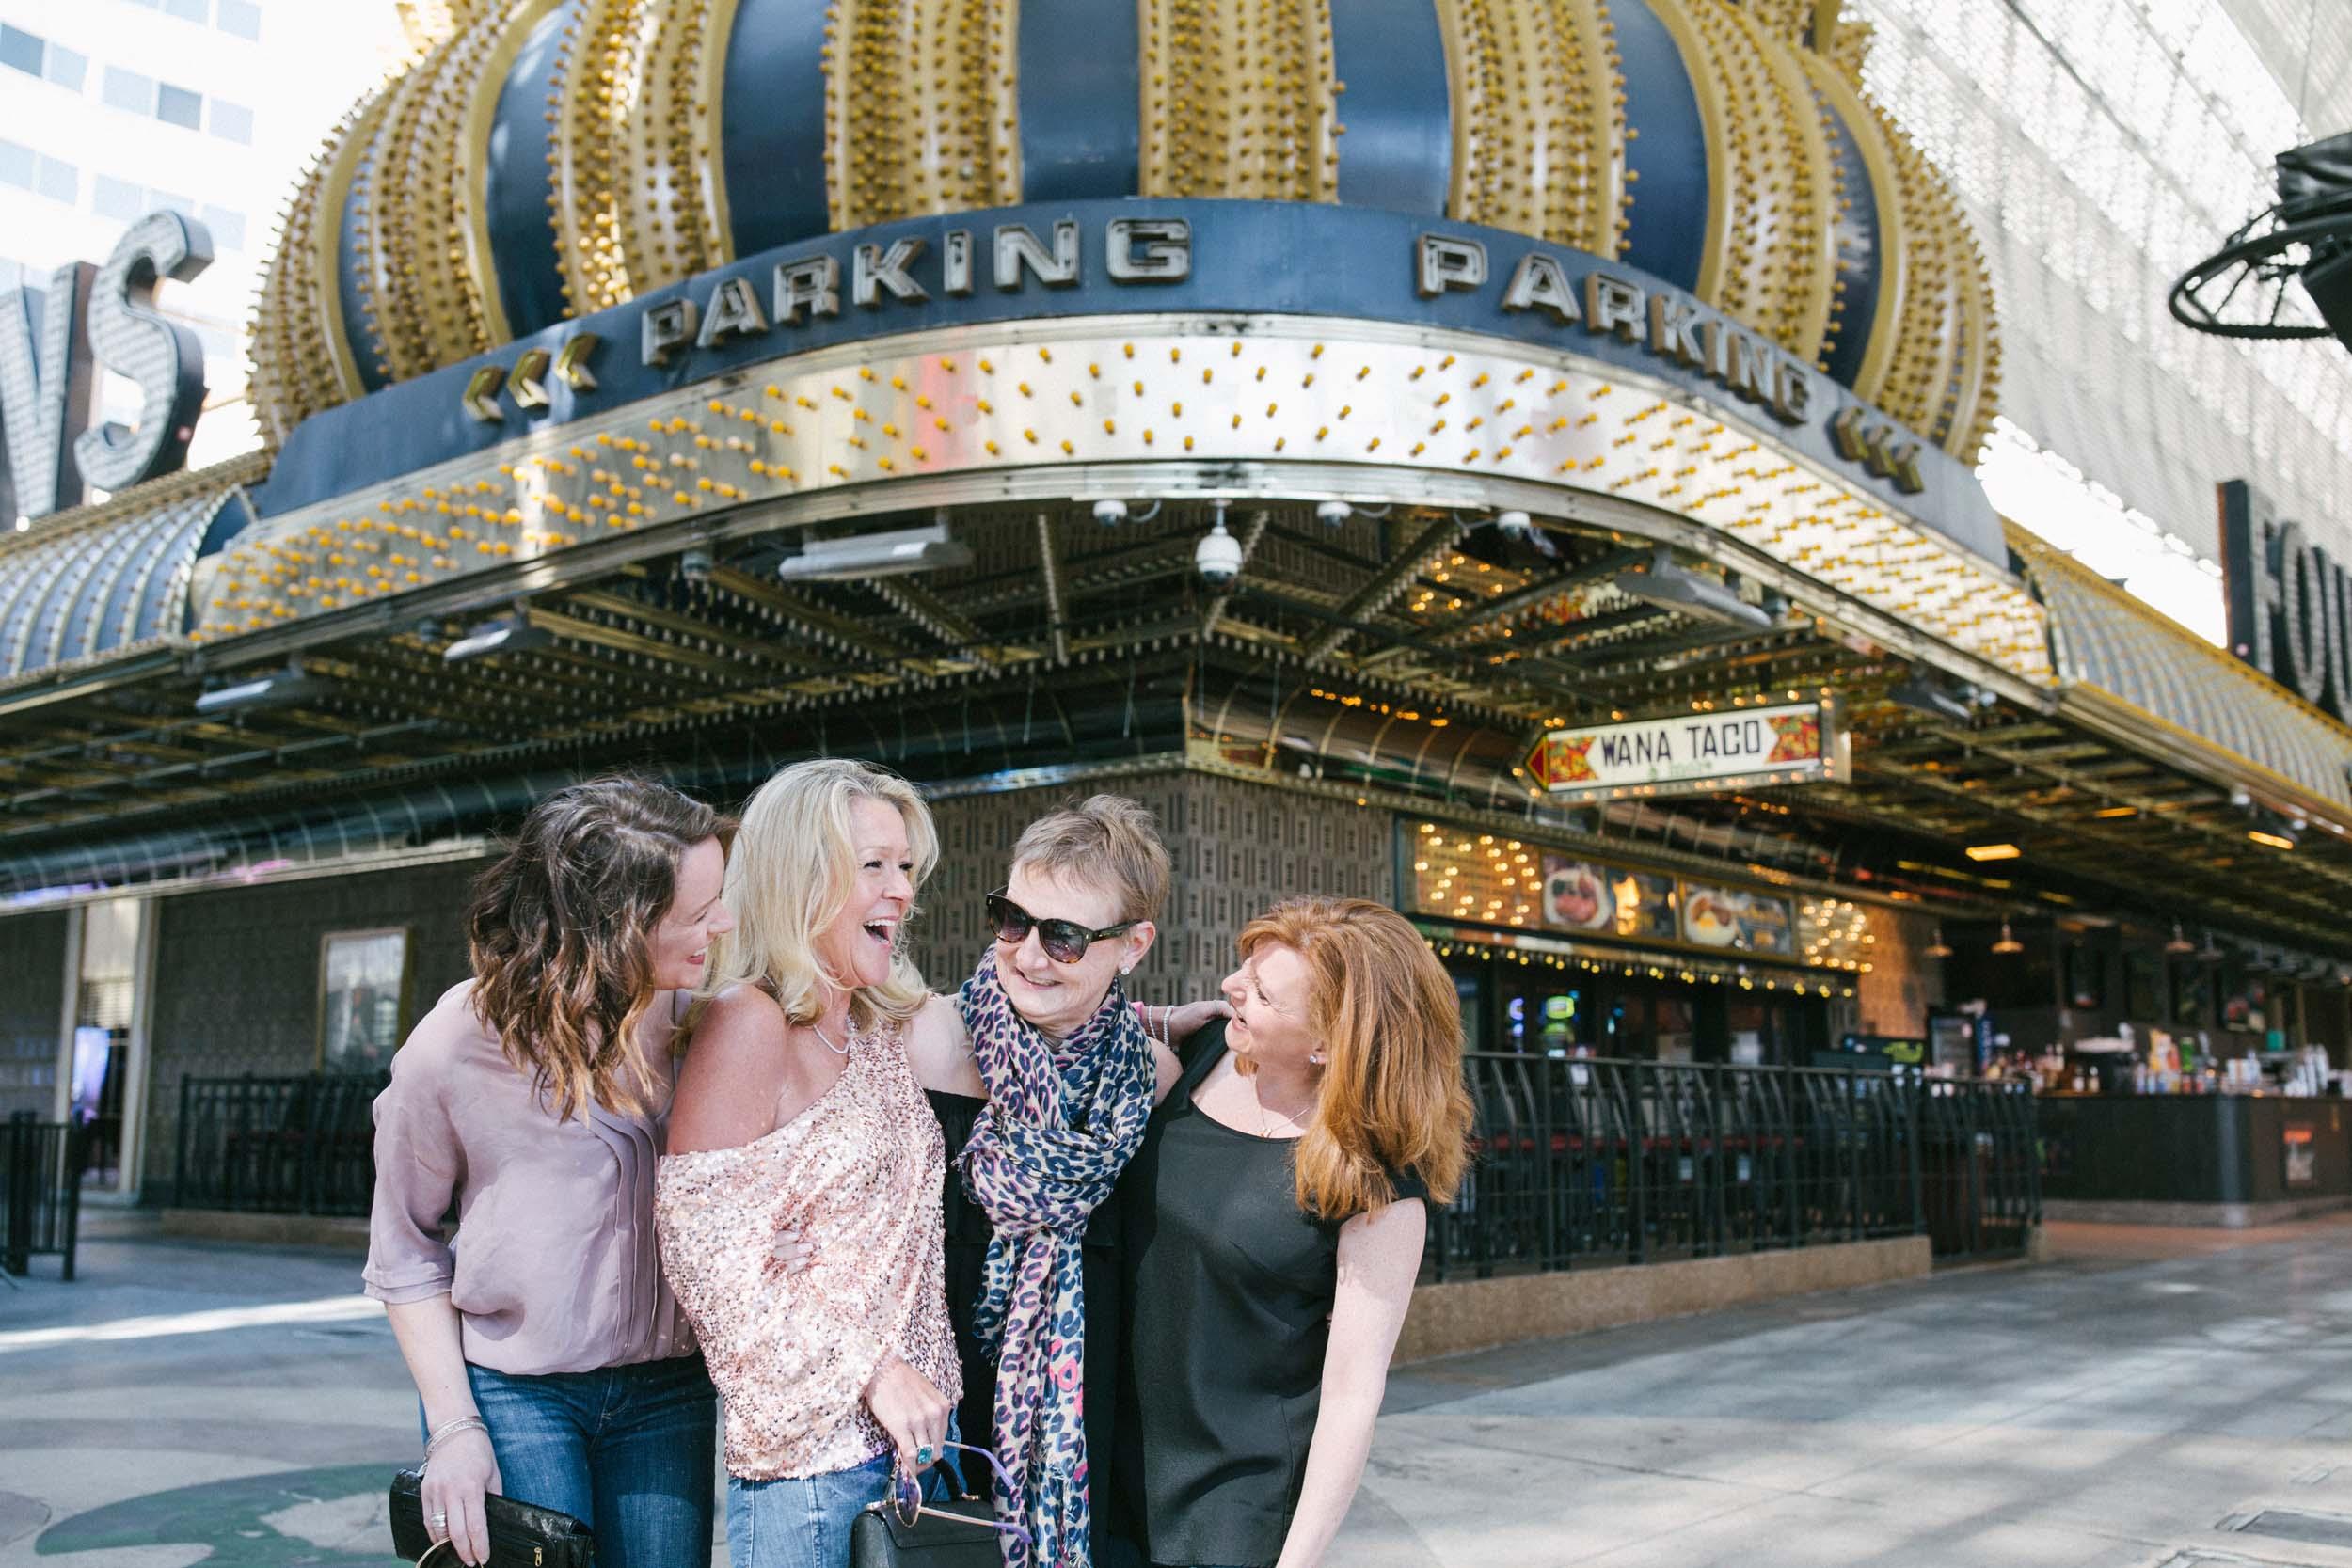 Best Things to Do in Las Vegas – Guide to Las Vegas